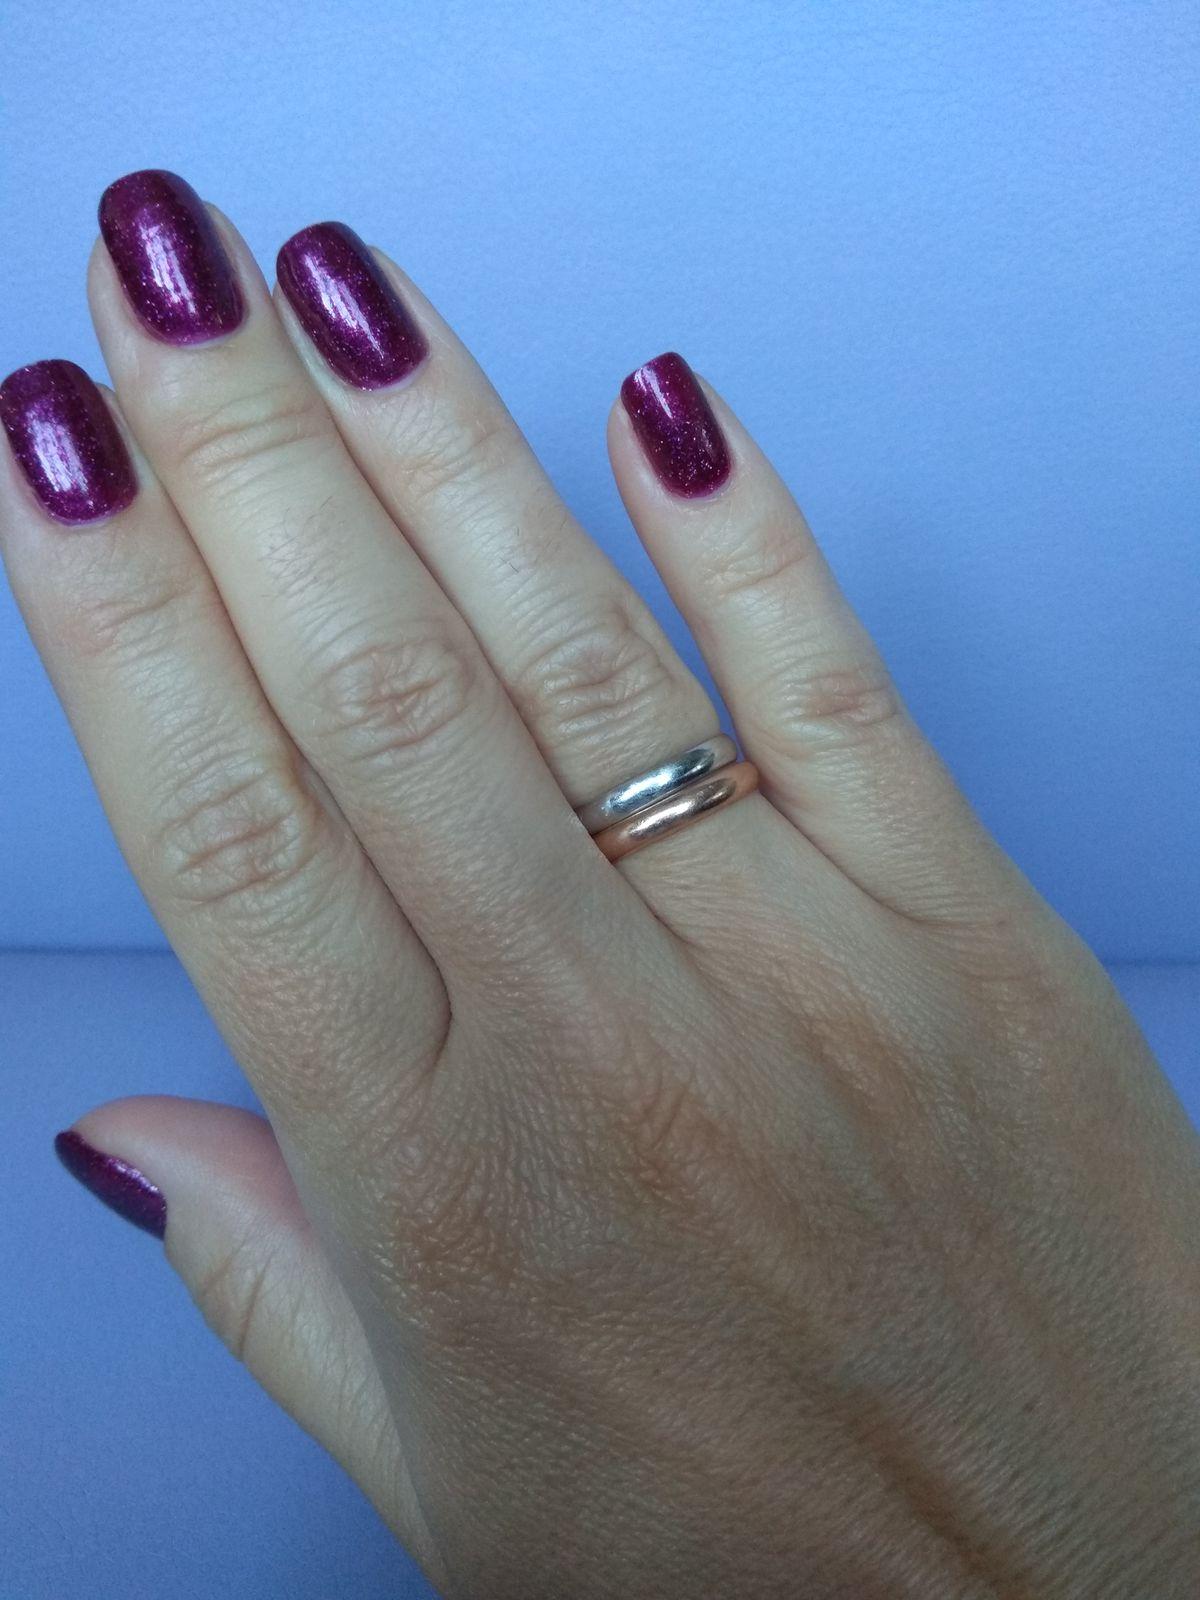 Кольцо к свадебному юбилею